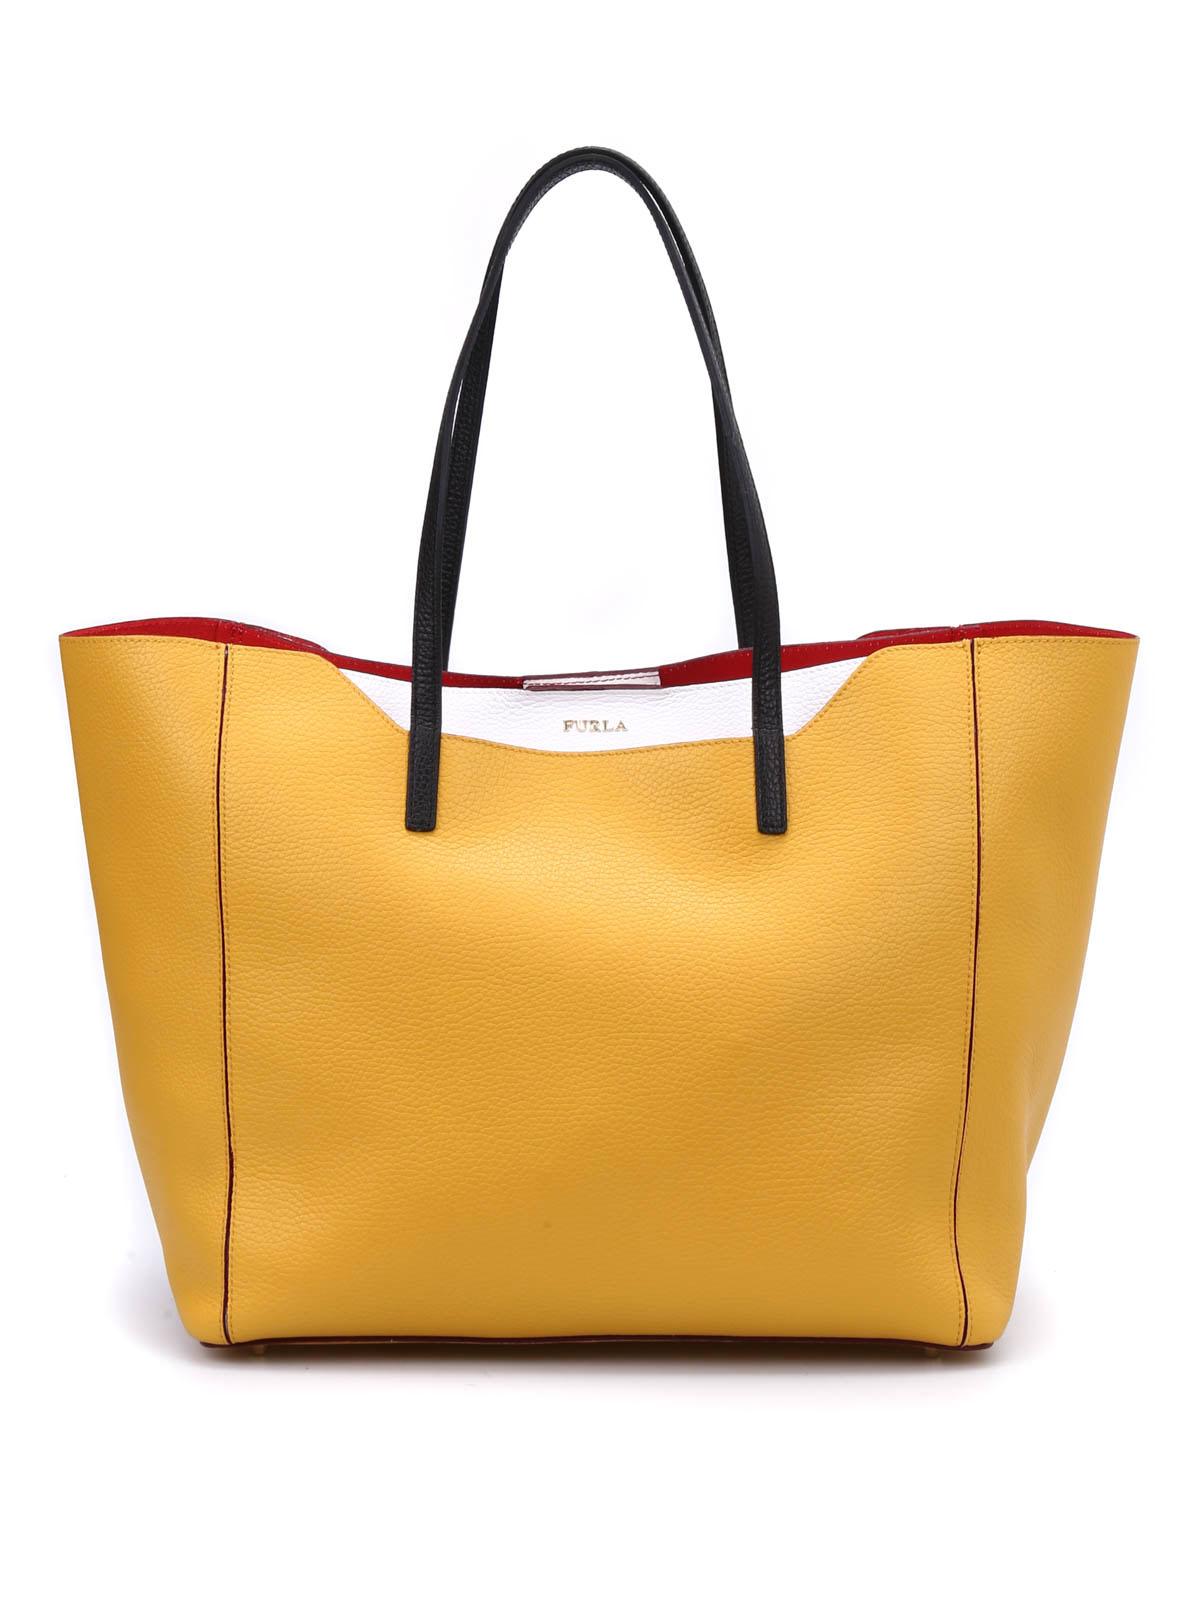 furla handtasch fantasia gelb handtaschen 811081 zam0. Black Bedroom Furniture Sets. Home Design Ideas